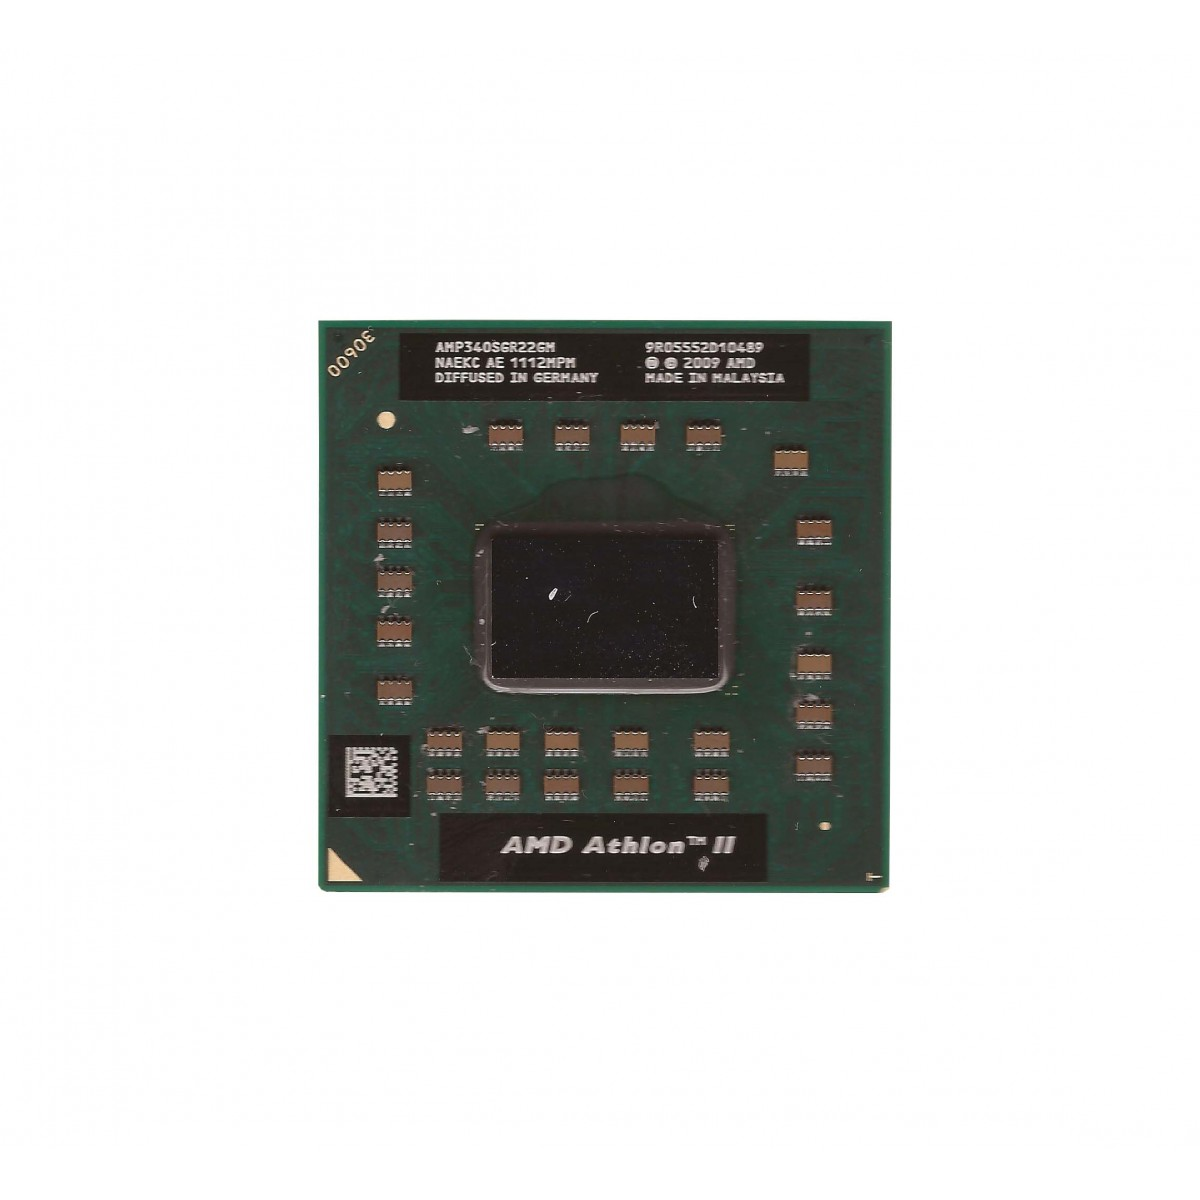 Processador Notebook AMD Athlon II Dual Core 2.20Ghz AMP340SGR22GM (semi novo)